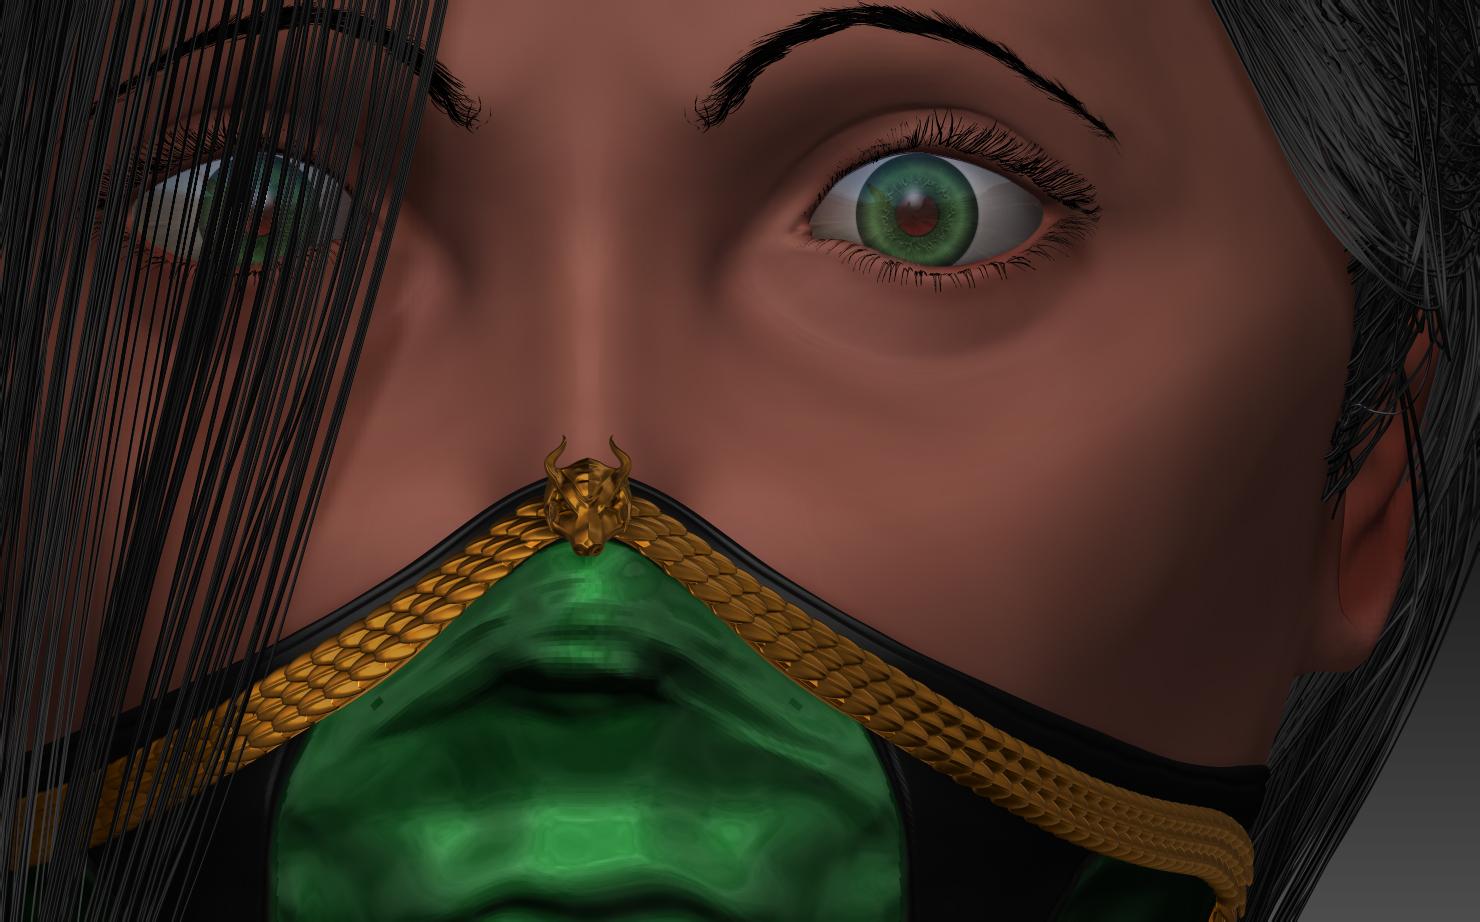 newmask01.jpg